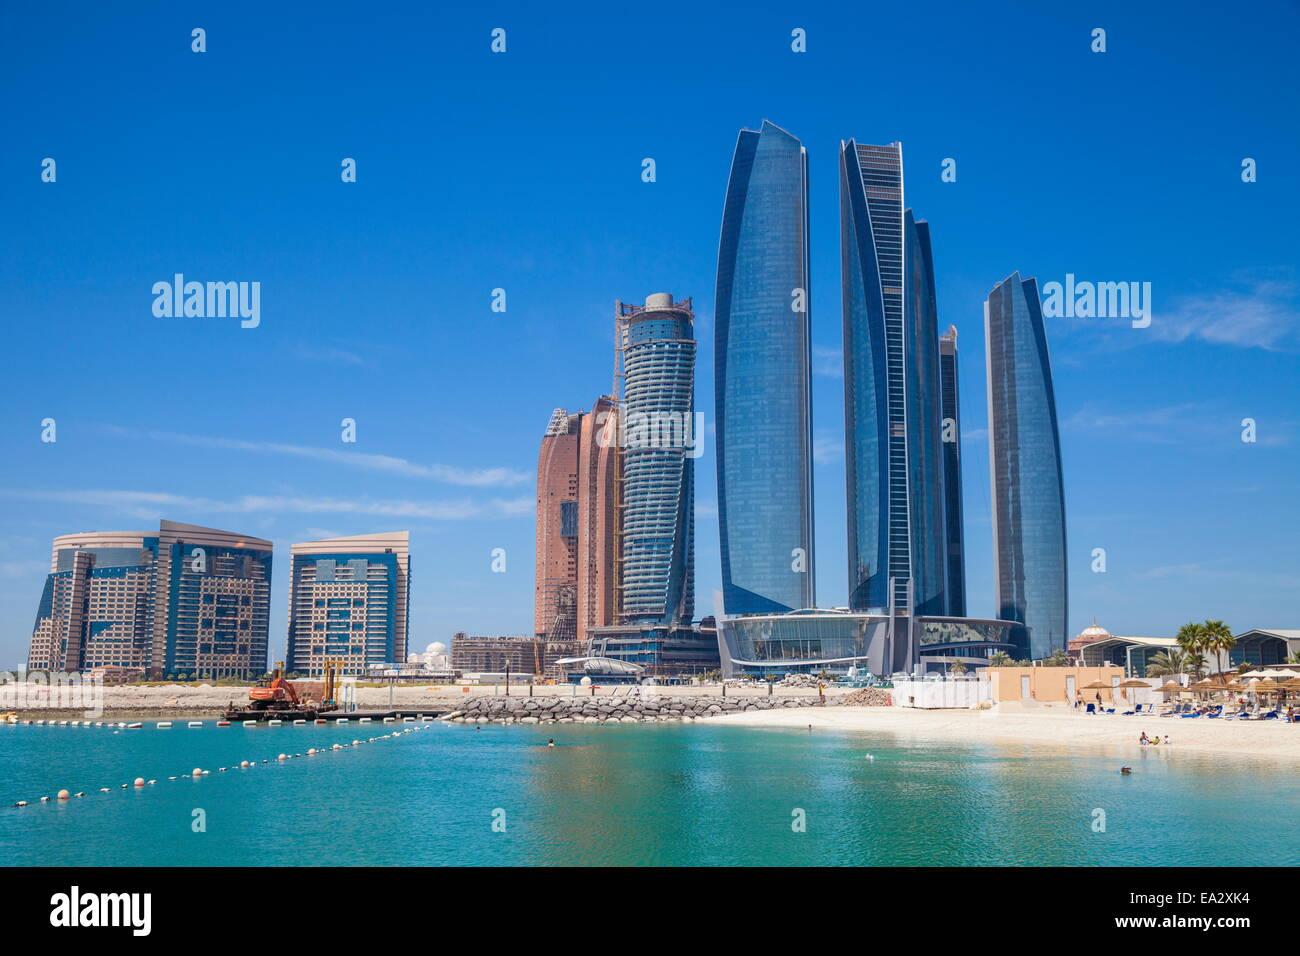 Etihad Towers, Abu Dhabi, Emiratos Árabes Unidos, Oriente Medio Imagen De Stock